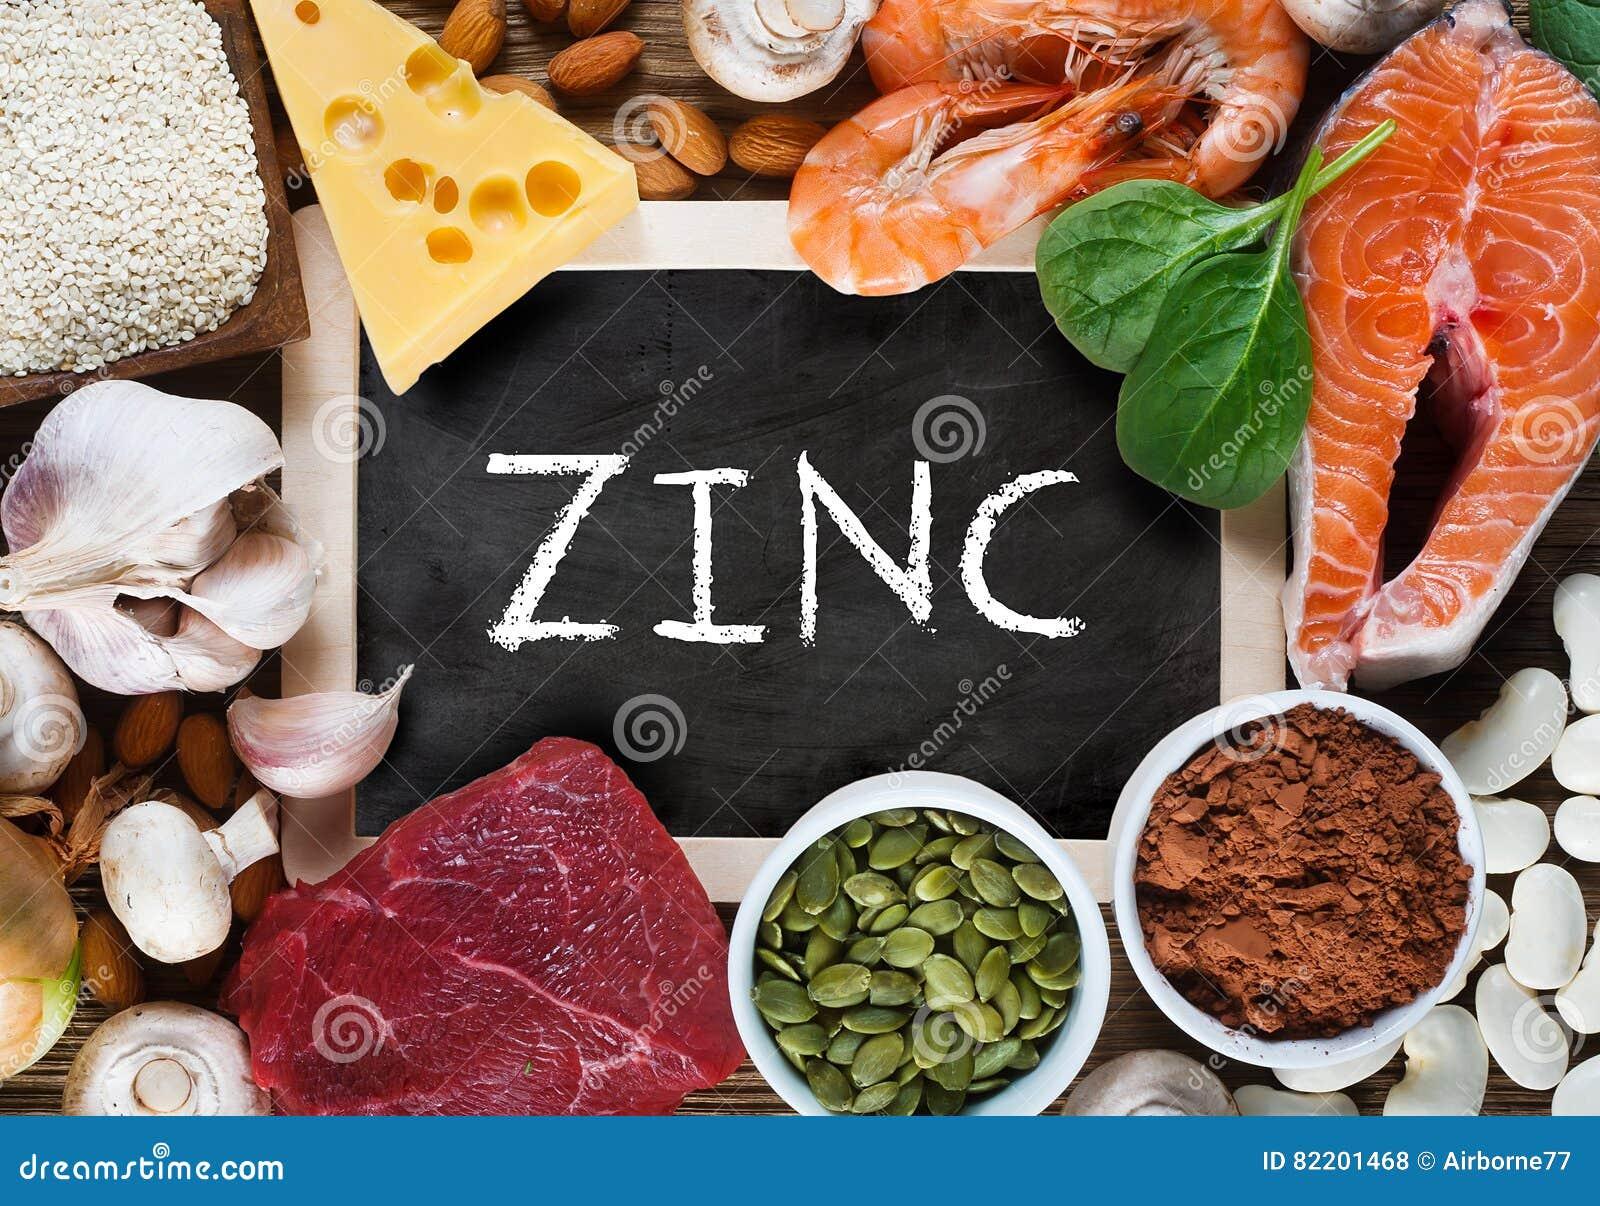 Foods High in Zinc sto...